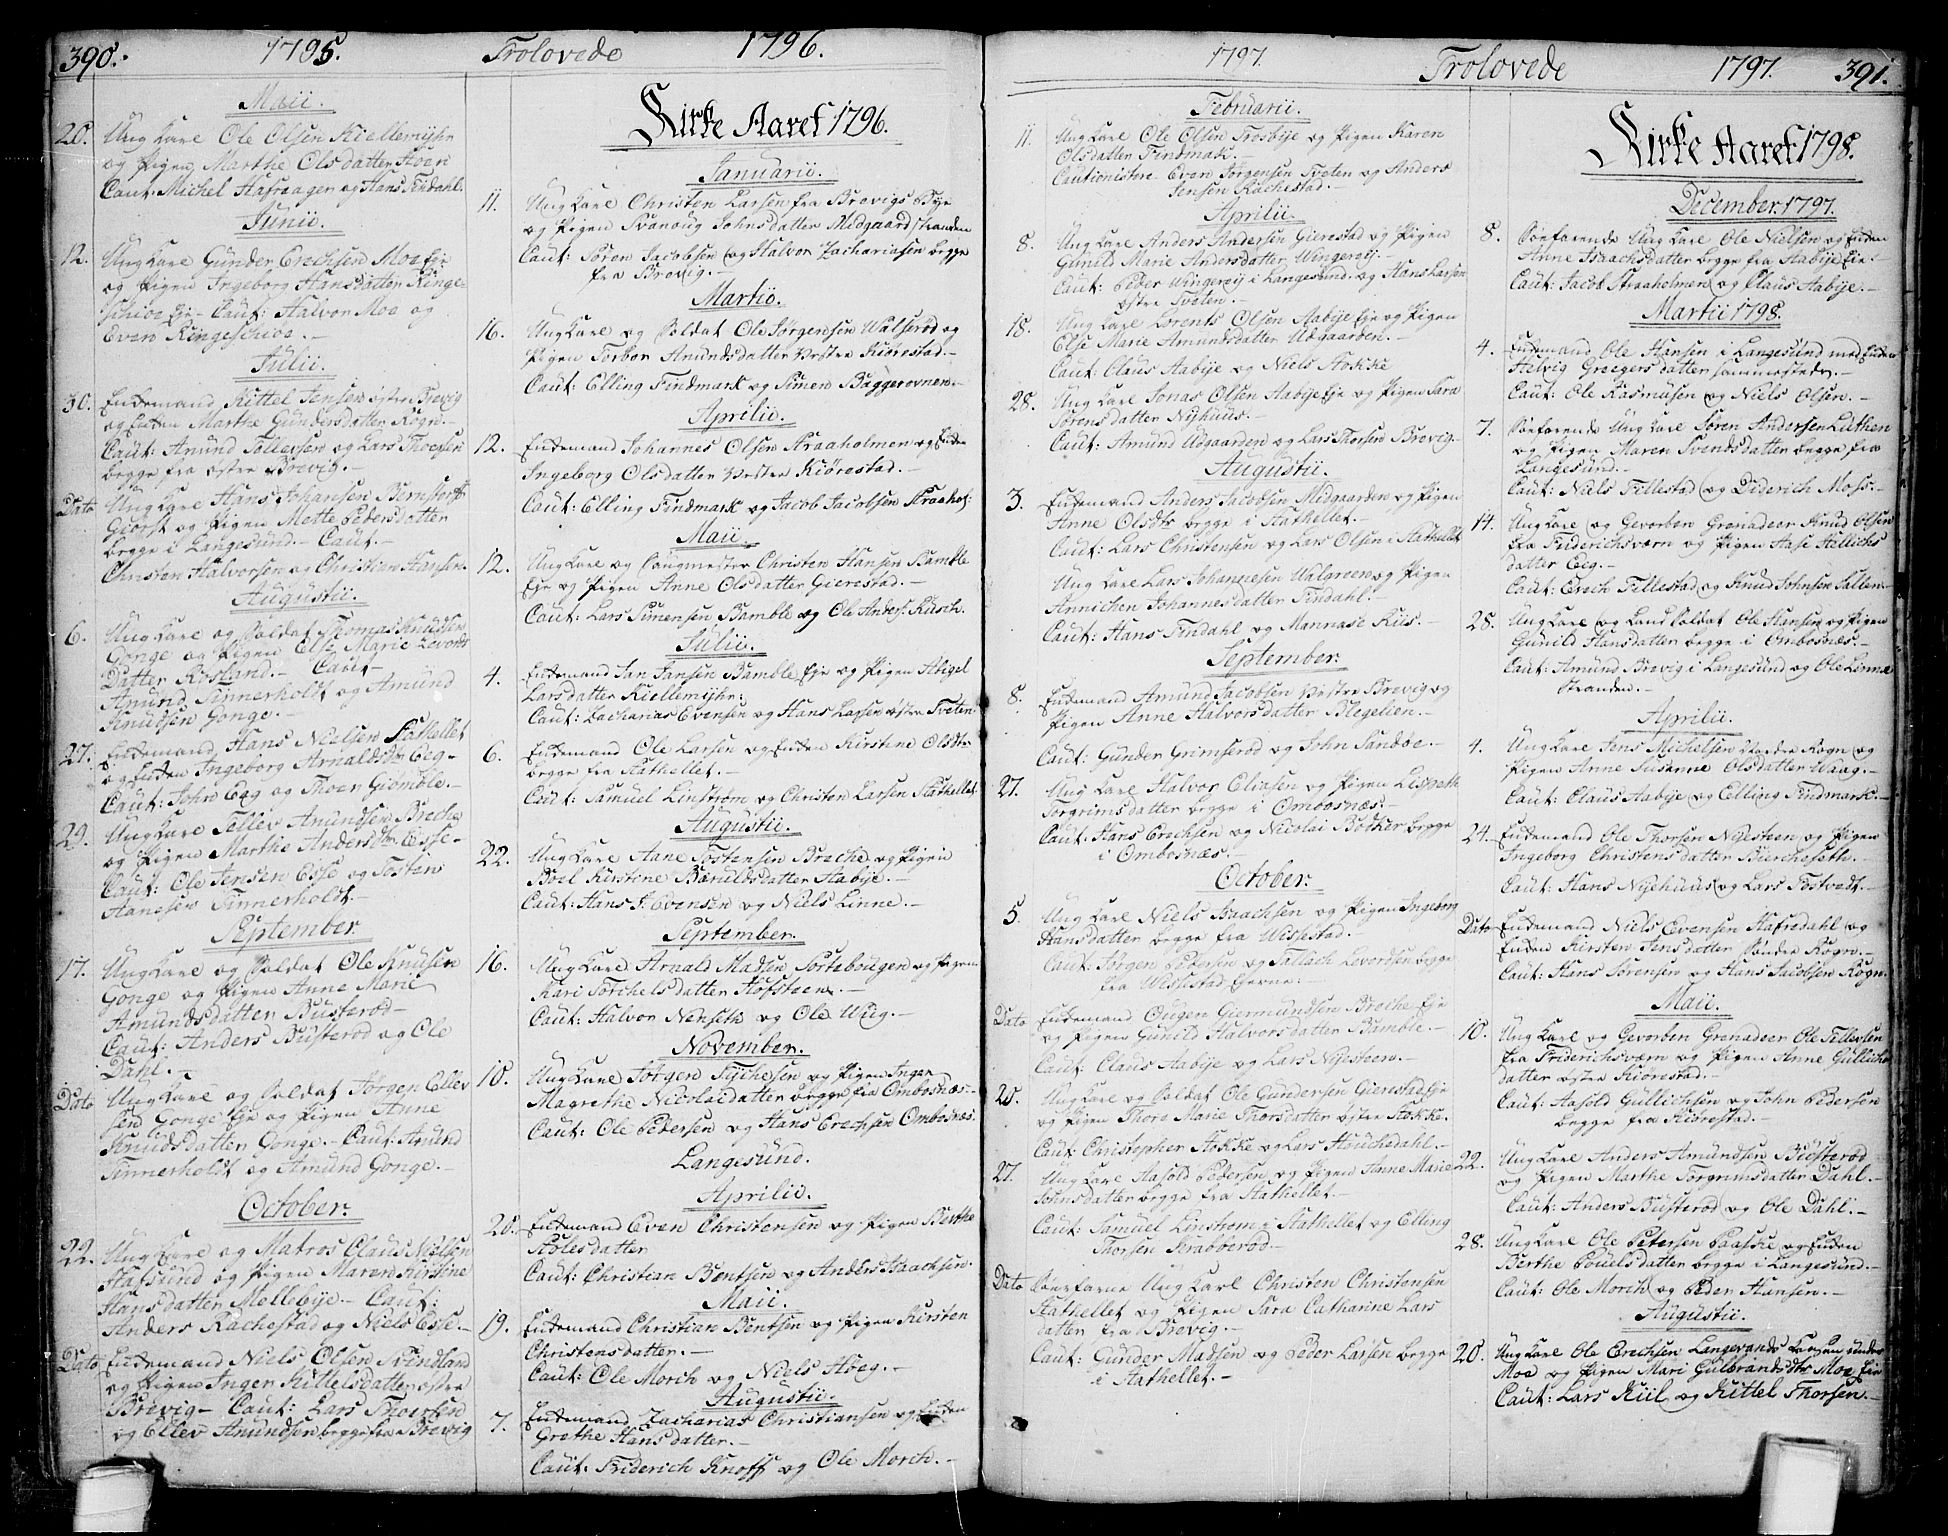 SAKO, Bamble kirkebøker, F/Fa/L0002: Ministerialbok nr. I 2, 1775-1814, s. 390-391